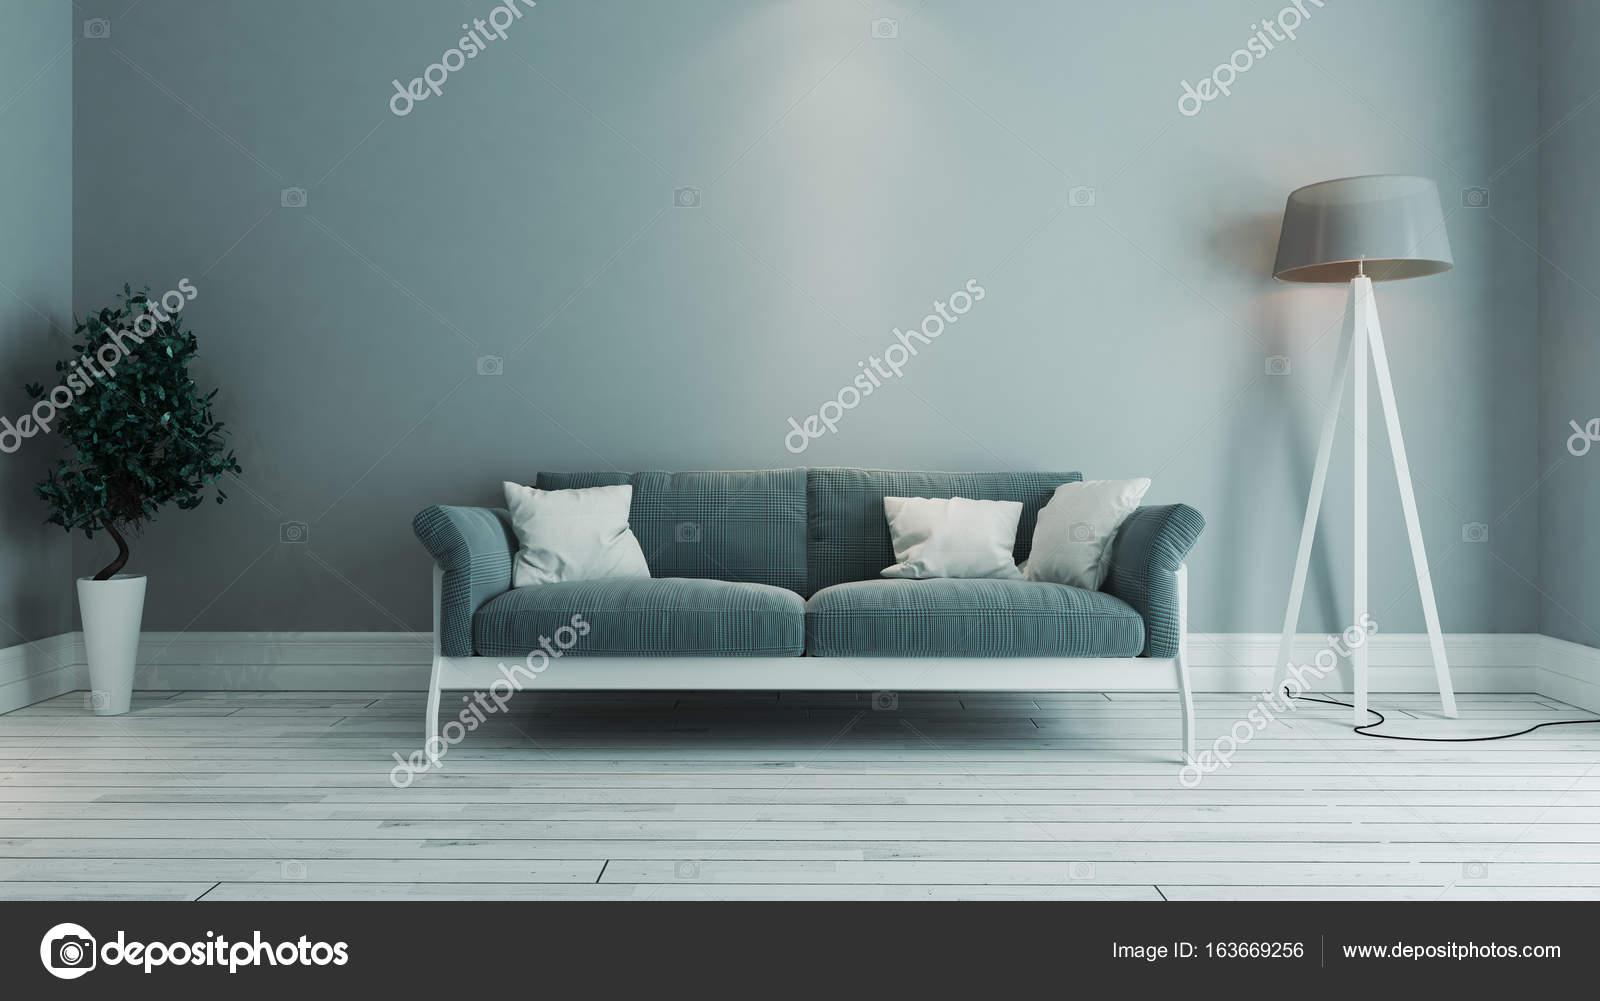 blauwe kleur woonkamer interieur design idee — Stockfoto © sseven ...